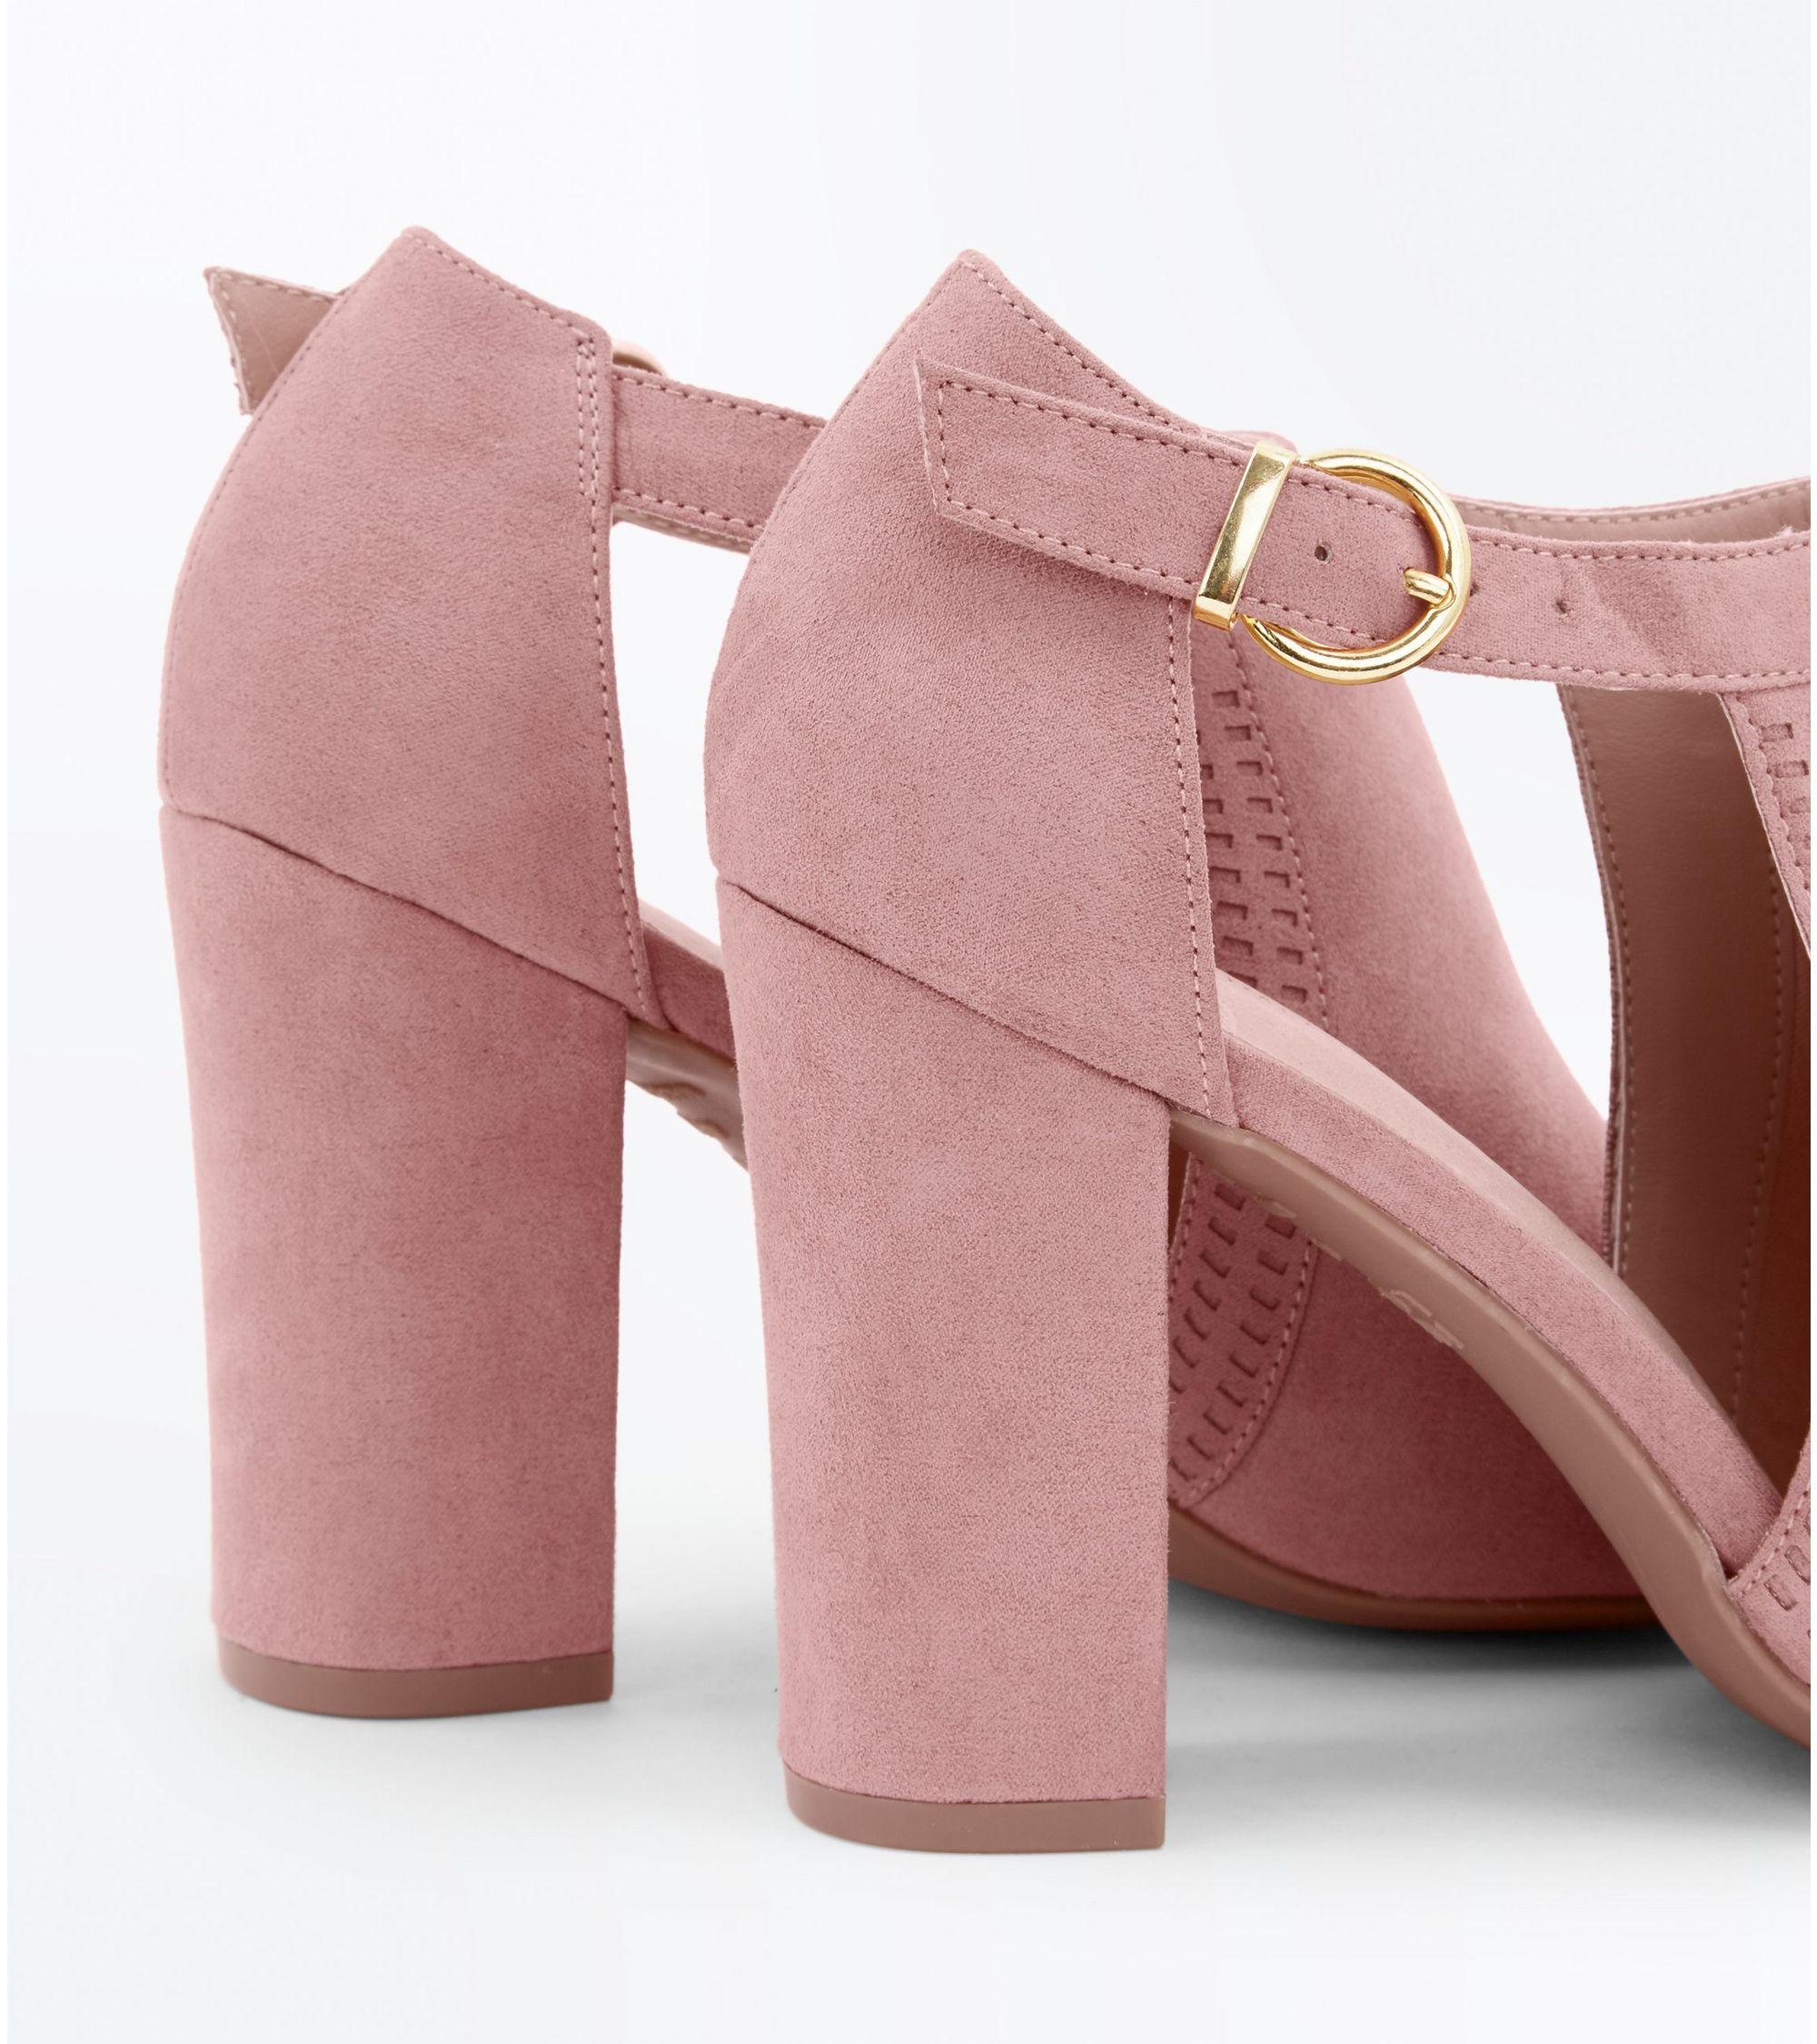 9c664071ffe26 New Look Pink Comfort Flex Cut Out Peep Toe Heels at £29.99